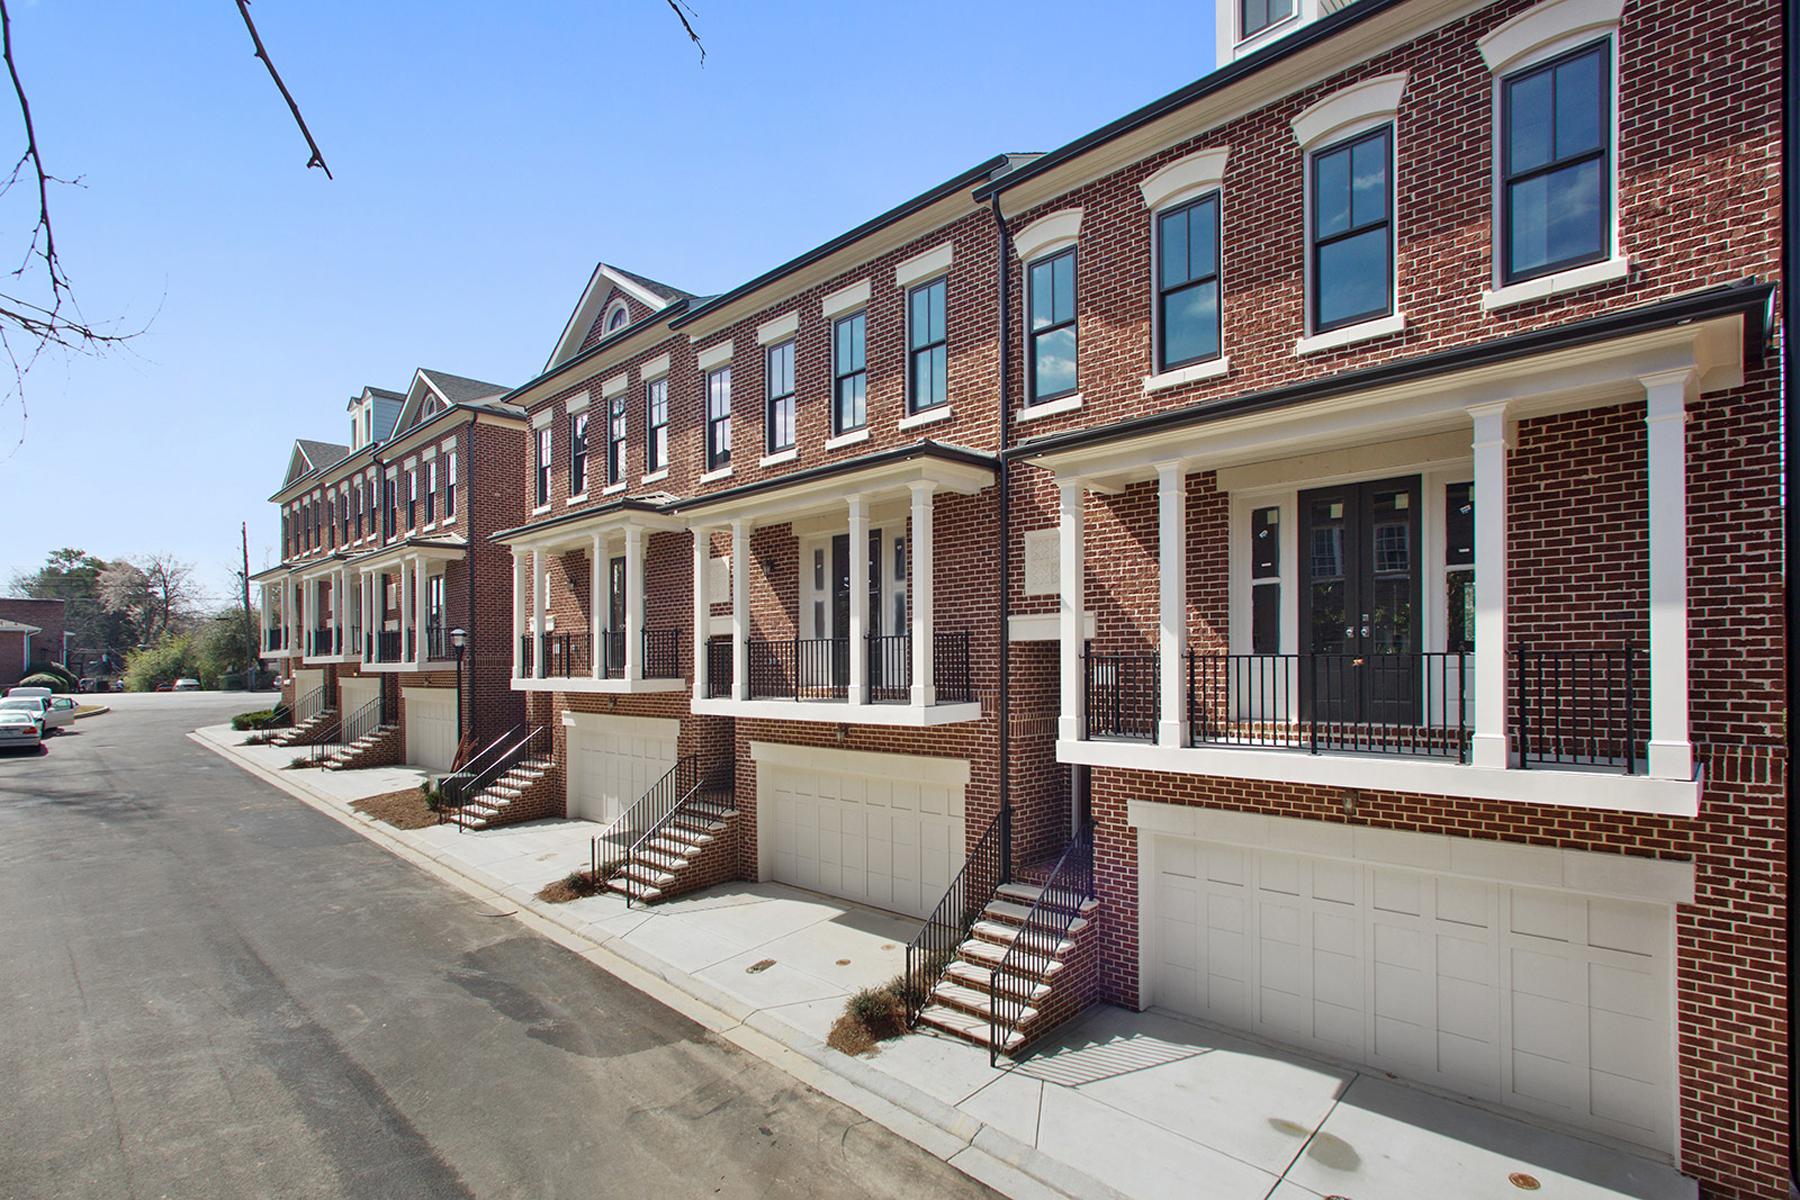 Townhouse for Sale at 3700 Peachtree 3700 Peachtree Road #5 Atlanta, Georgia, 30319 United States